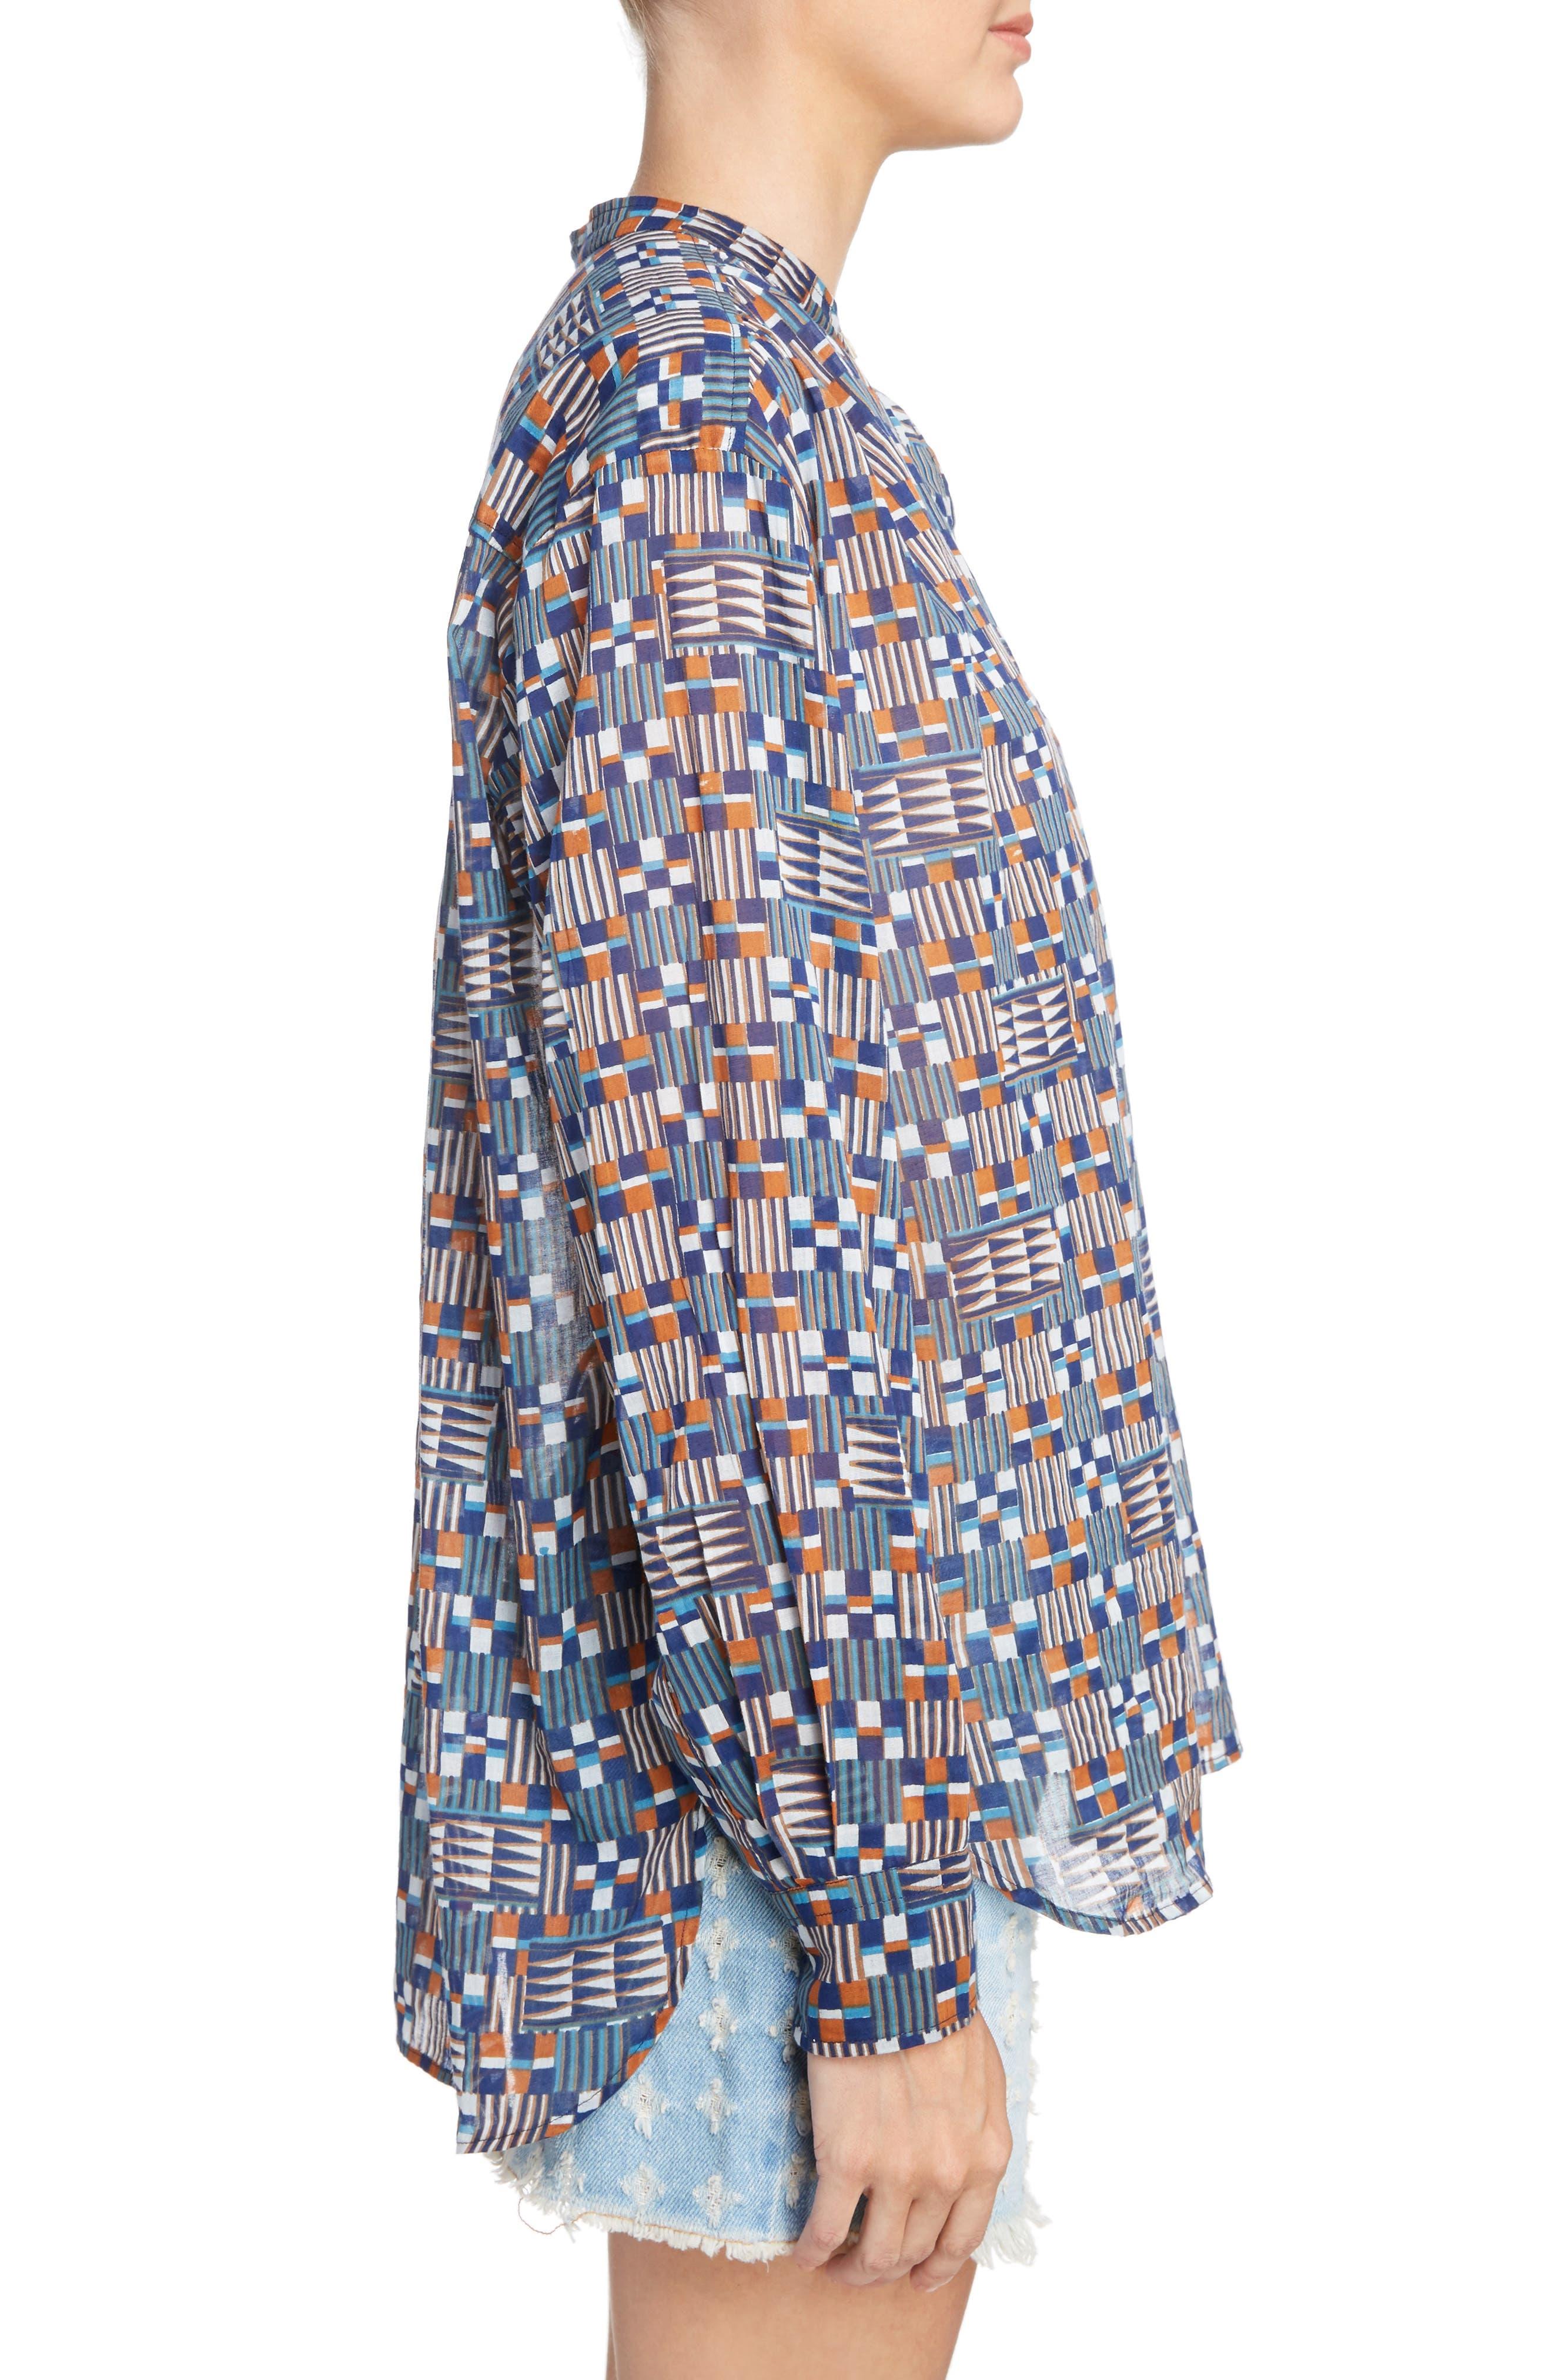 Isabel Marant Étoile Nahla Print Cotton Shirt,                             Alternate thumbnail 3, color,                             400